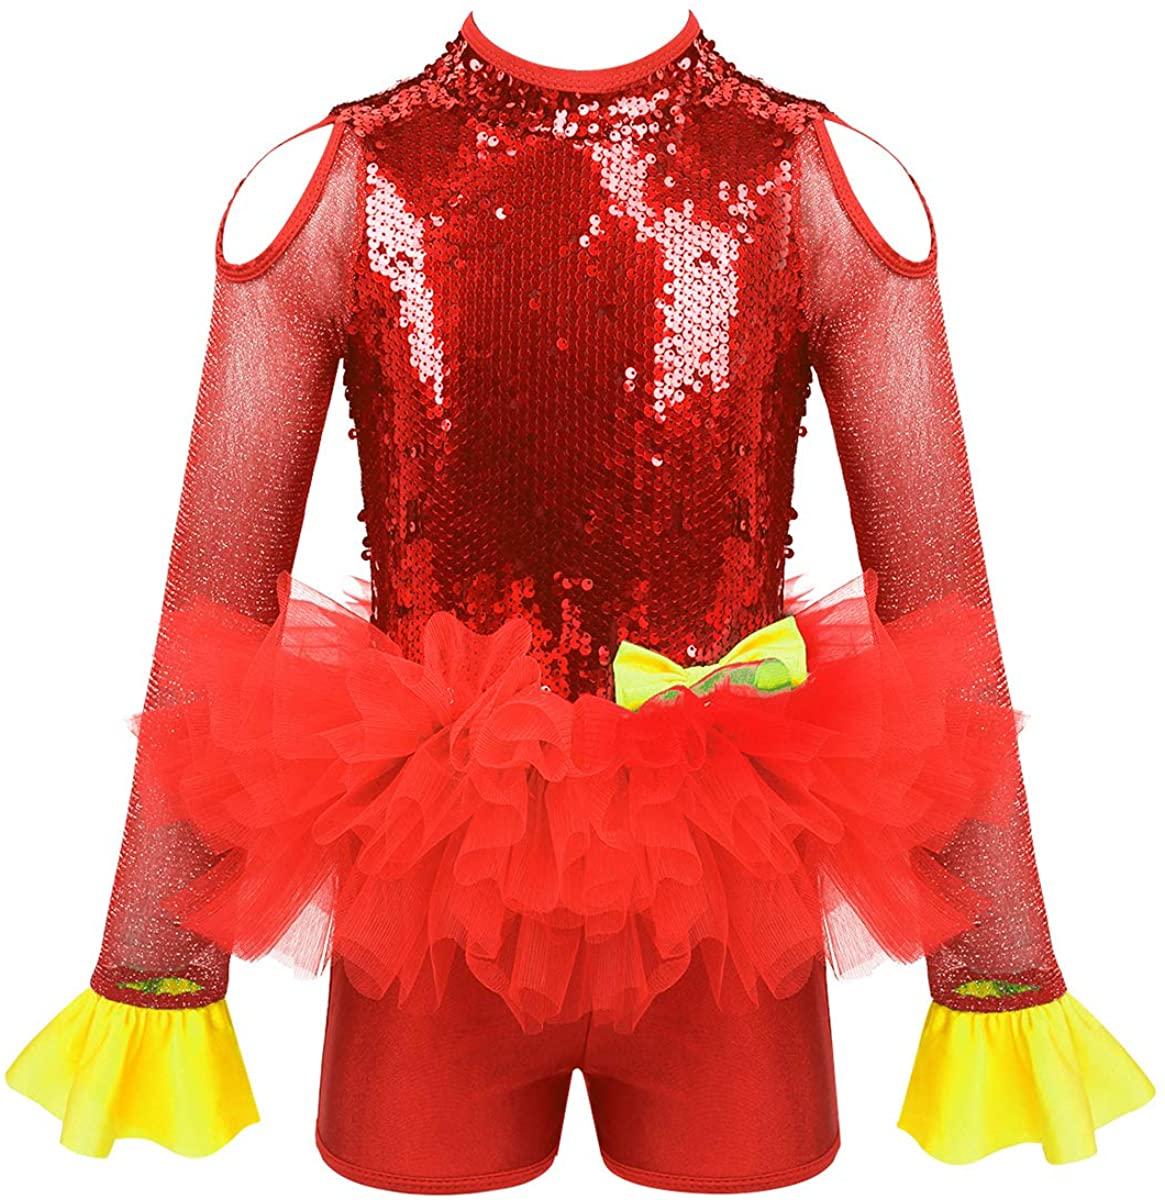 ACSUSS Kids Girls Sequins Ballet Leotard Jumpsuit Hip-hop Latin Jazz Dancing Dress Stage Performance Dance Costume